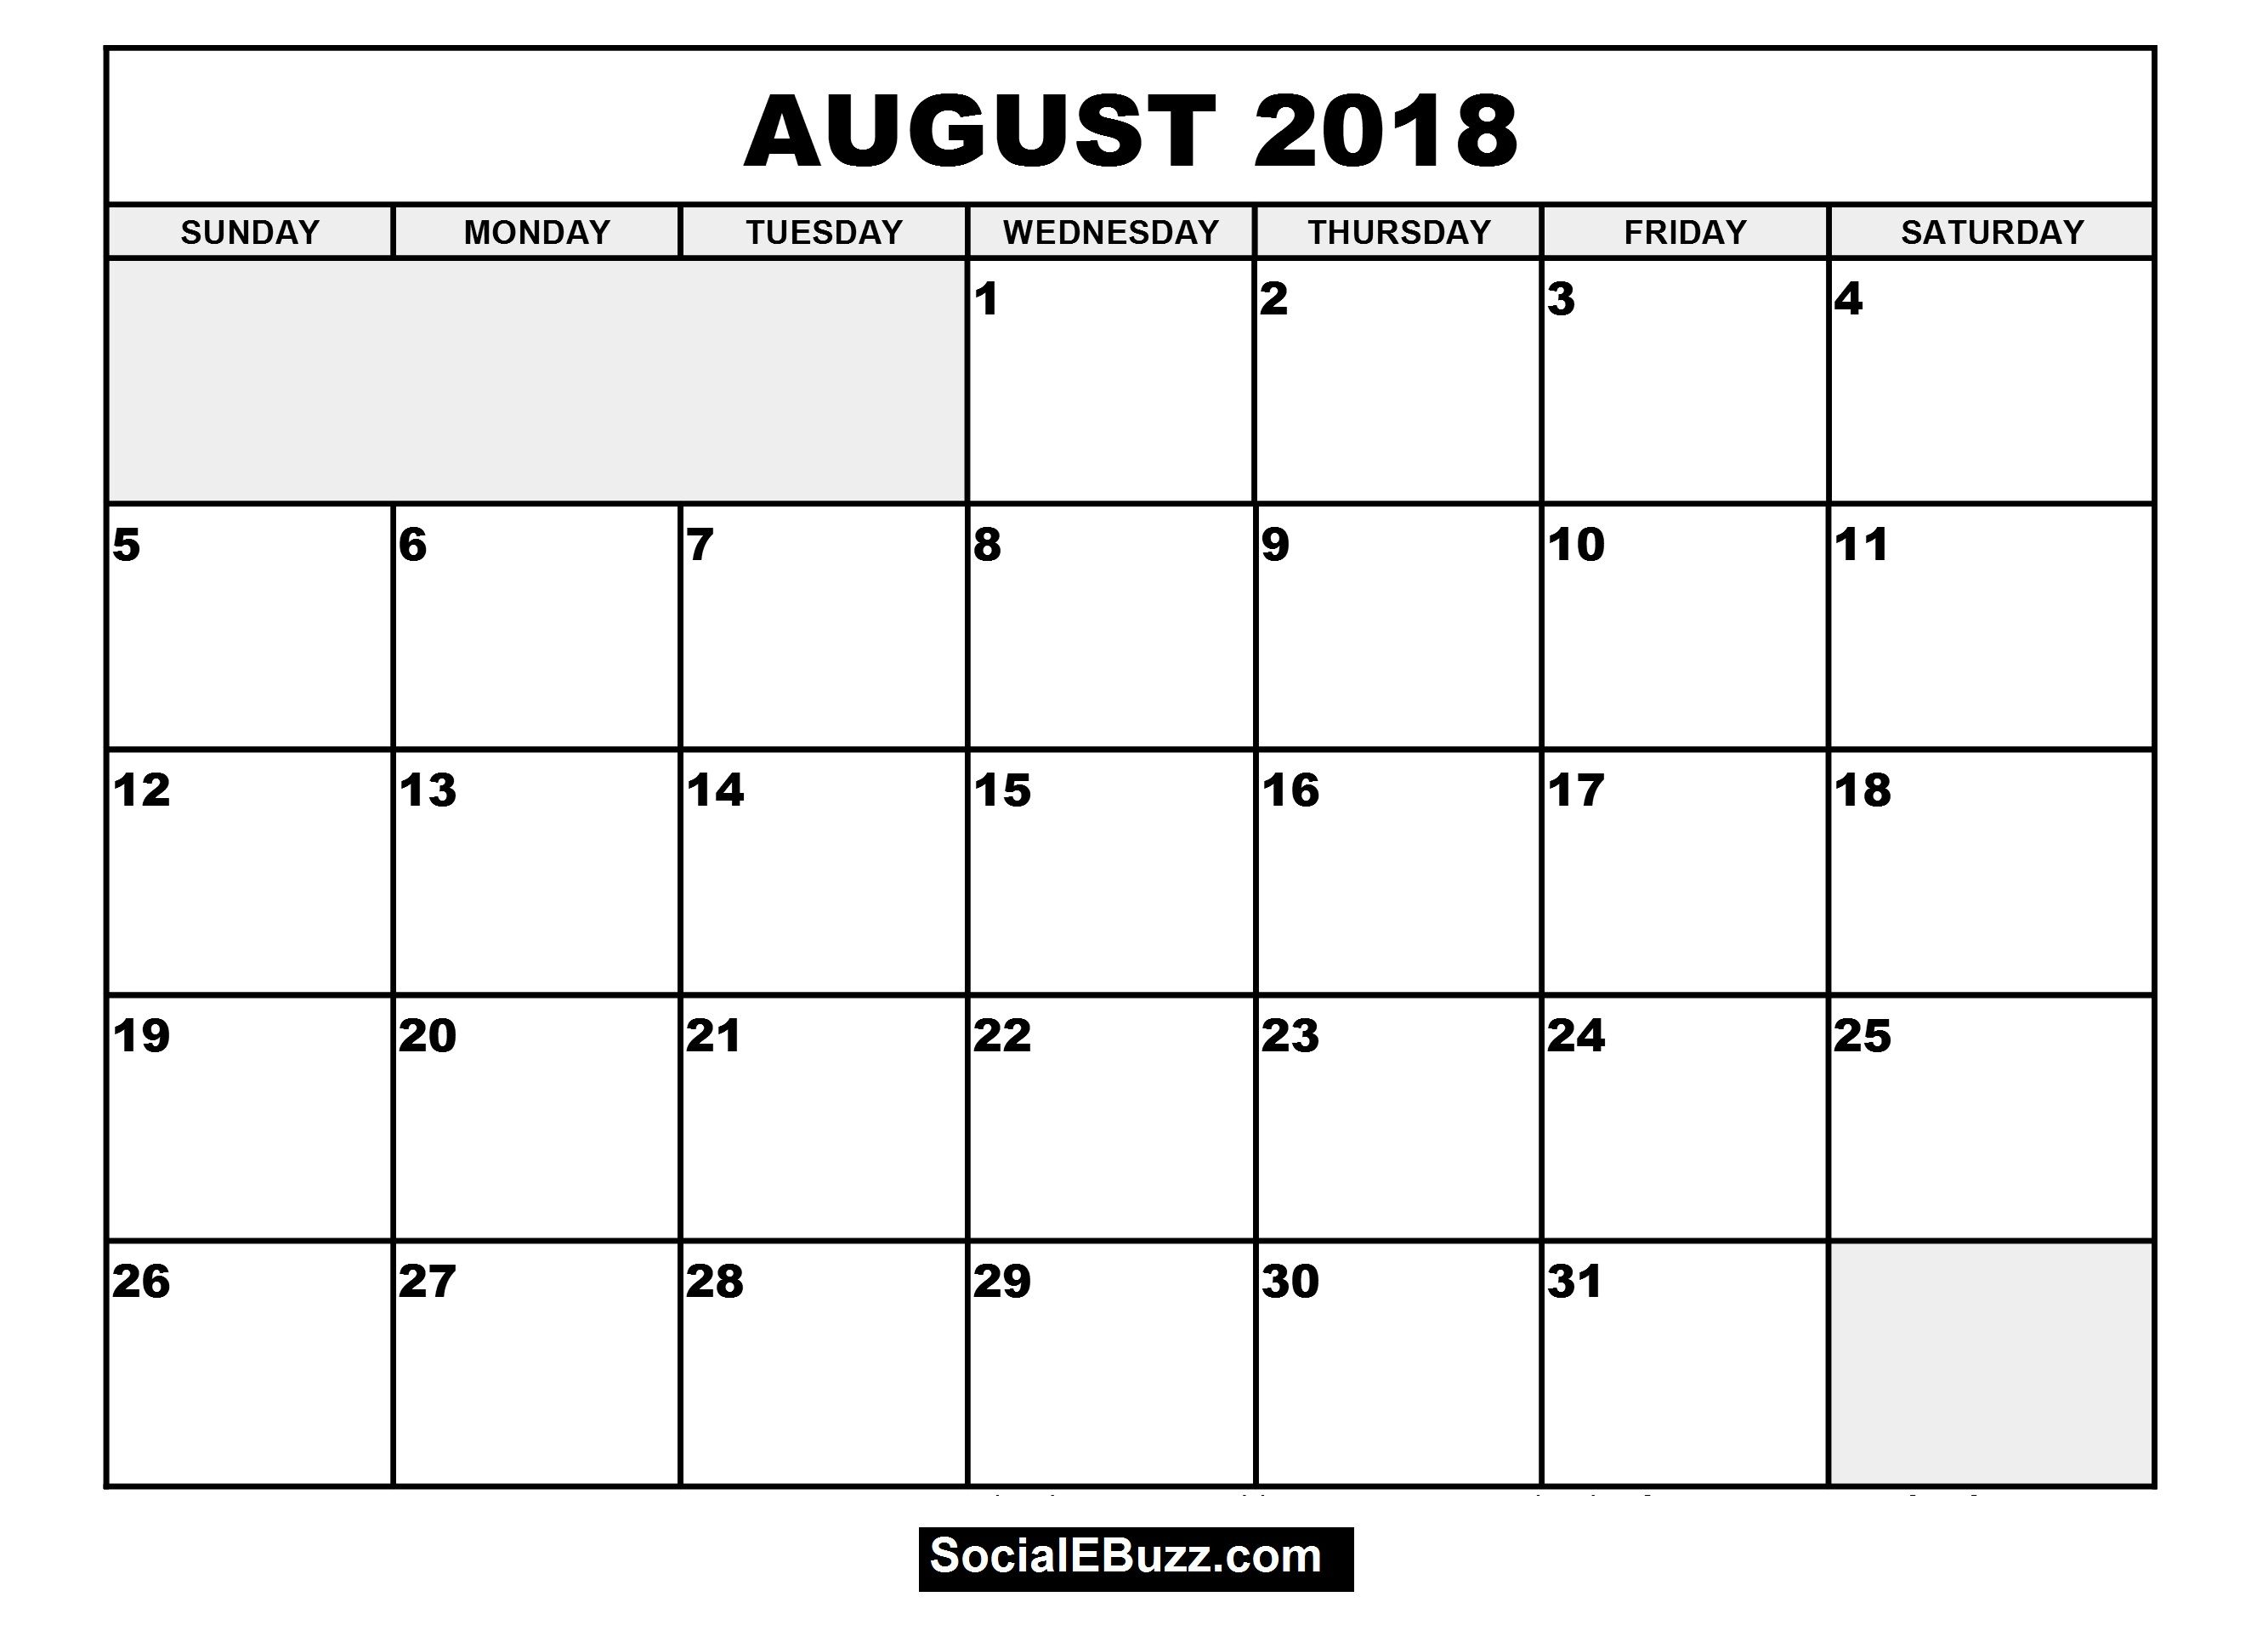 August 2018 Calendar Printable Template | August 2018 Calendar Blank pertaining to Cute August Monthly Calendar Template Printable